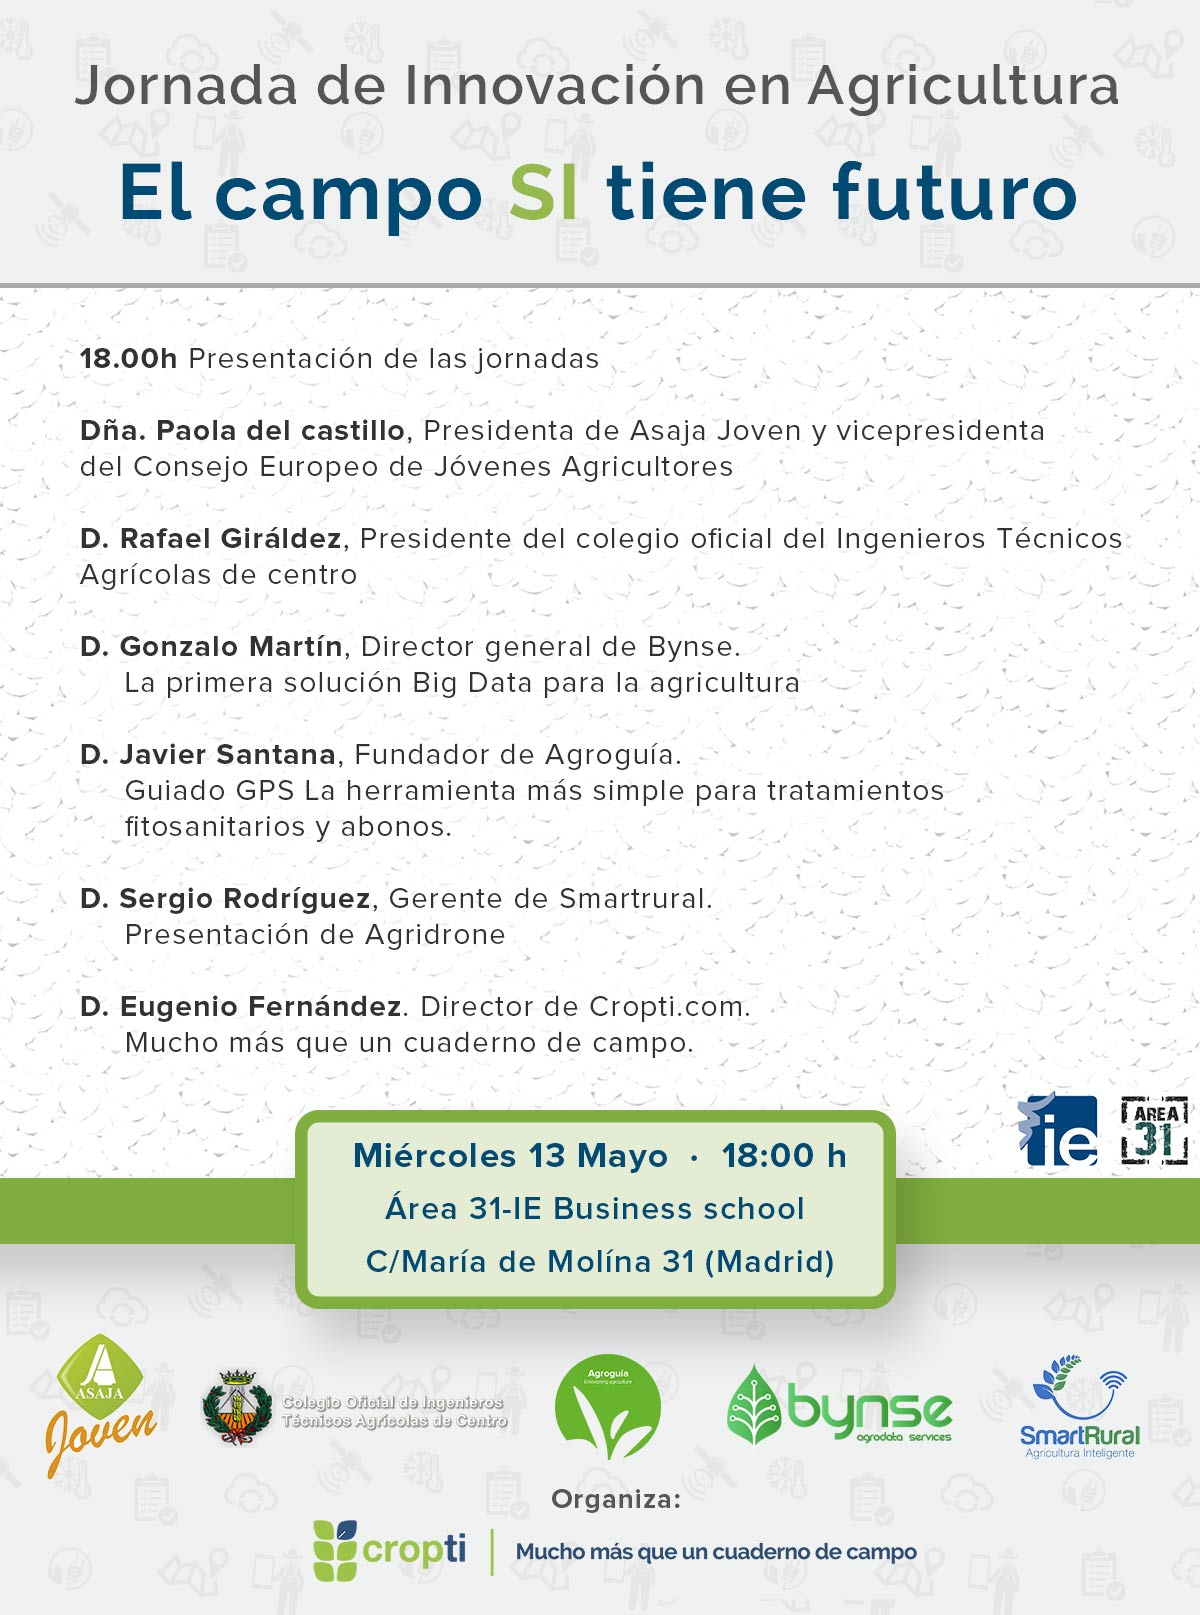 cartel-jornada-innovacion-13-05-2015 (1)